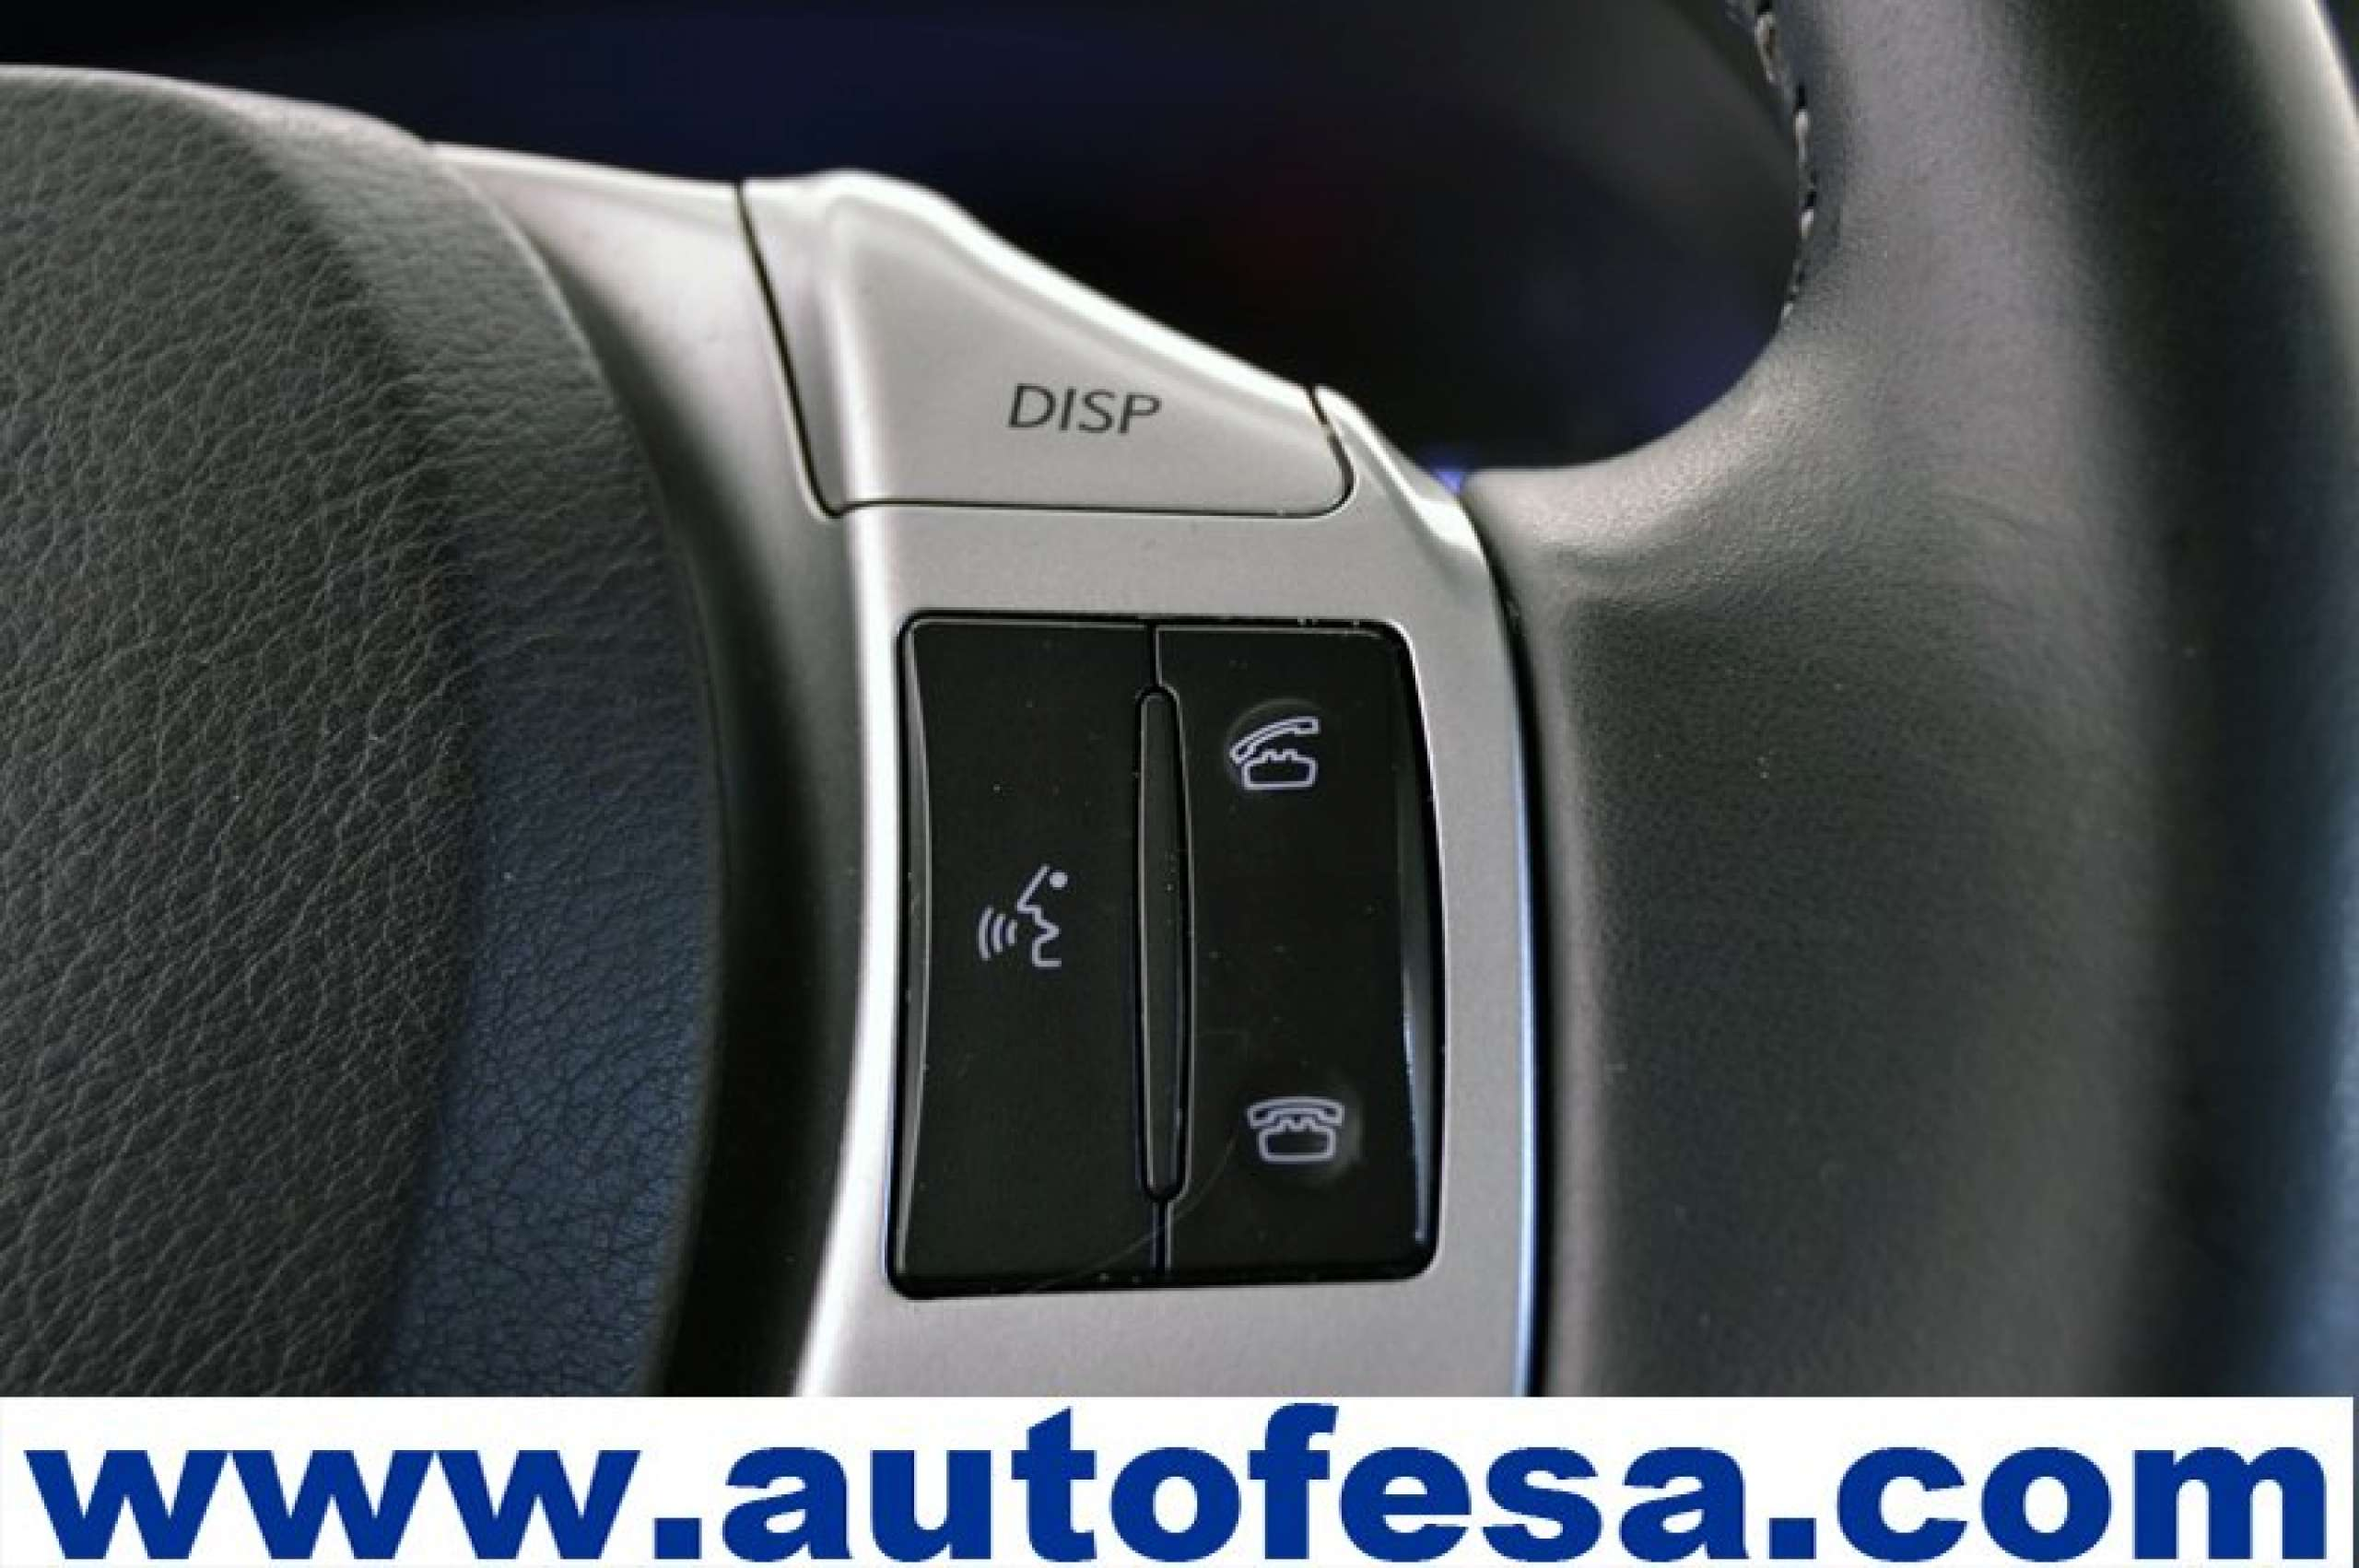 Lexus Ct 200h 1.8 136cv Eco Auto 5p - Foto 21